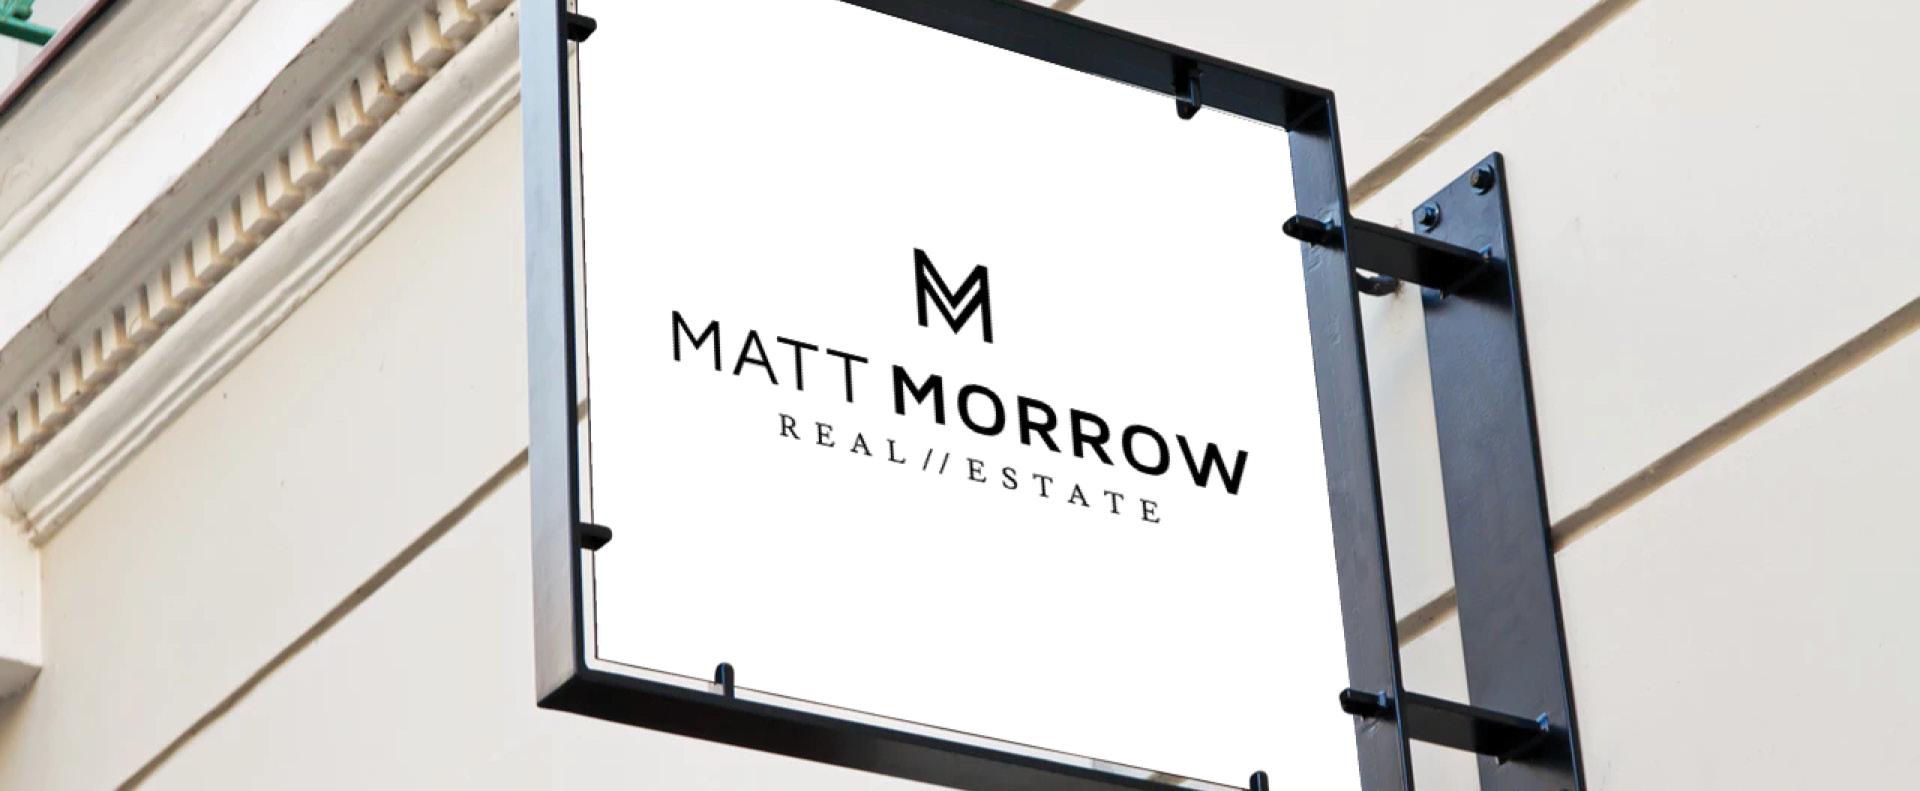 Matt Morrow Real Estate signage - White Canvas Design